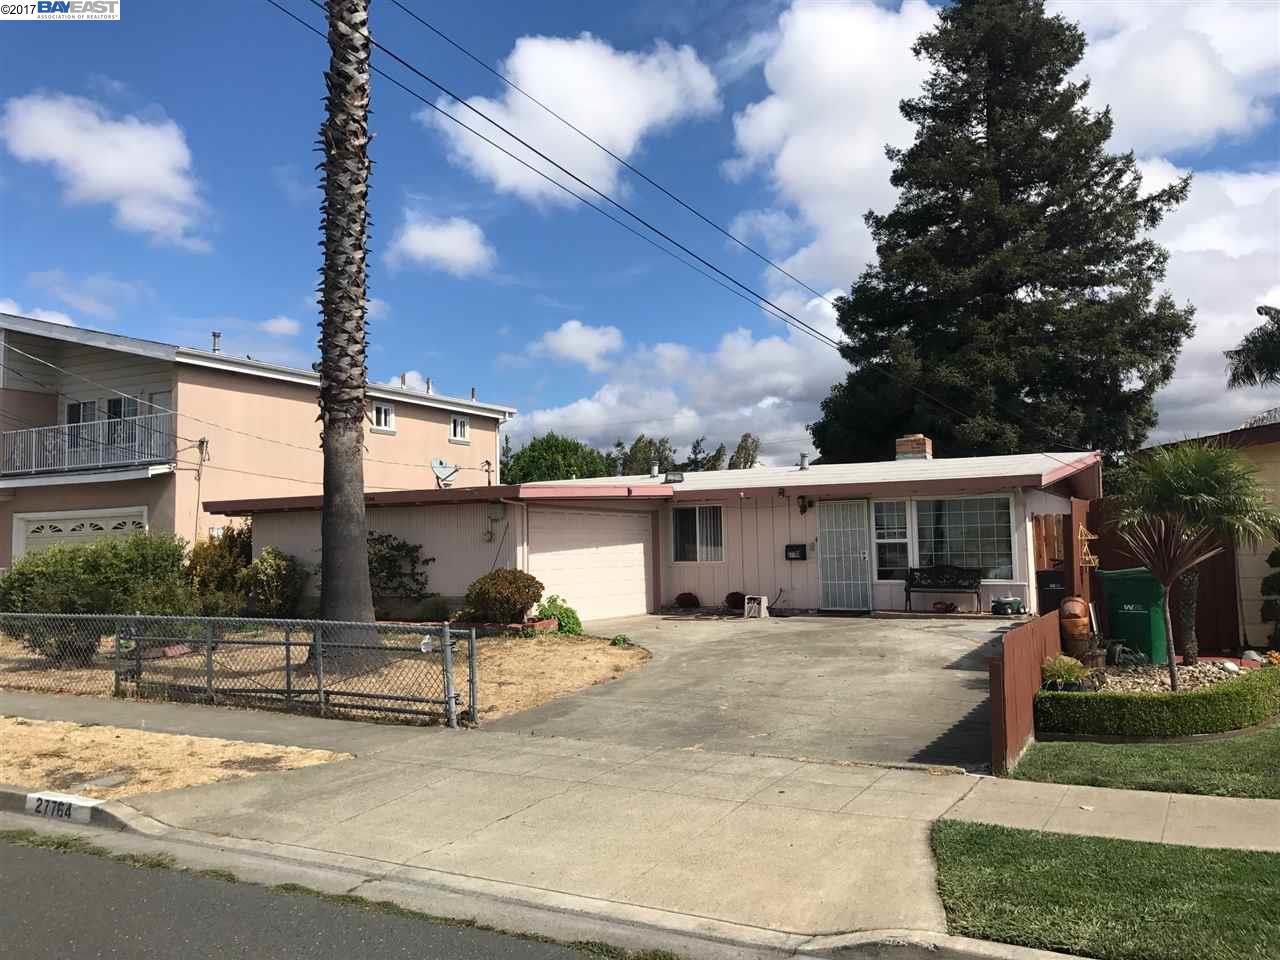 獨棟家庭住宅 為 出售 在 27764 Calaroga Avenue 27764 Calaroga Avenue Hayward, 加利福尼亞州 94545 美國